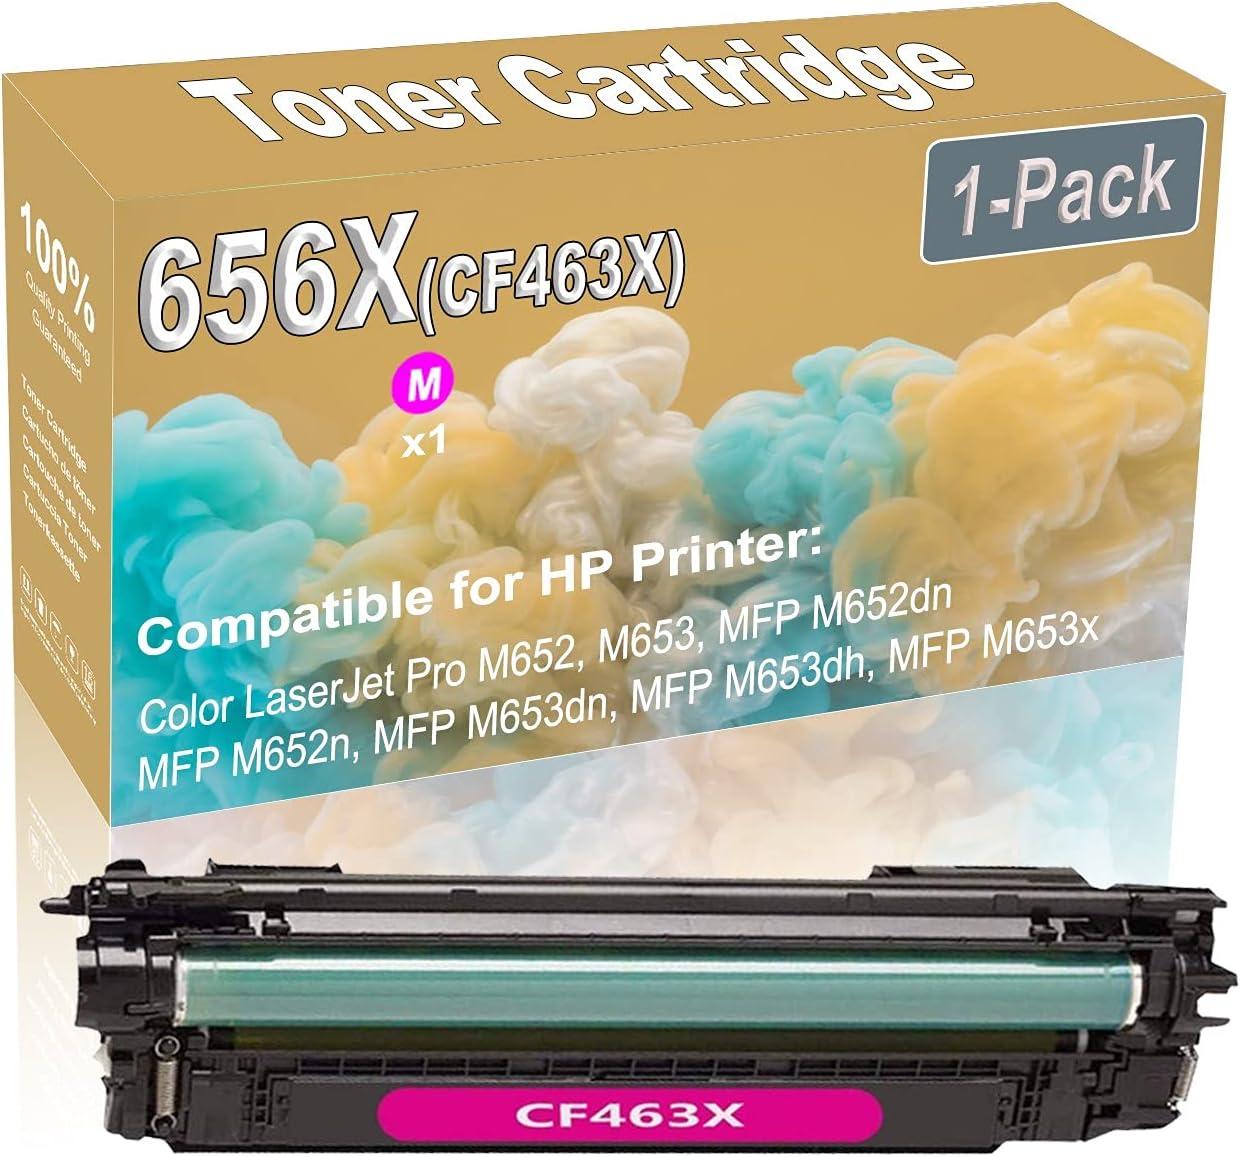 1-Pack (Magenta) Compatible High Yield 656X (CF463X) Printer Toner Cartridge use for HP M652 M653 Printers